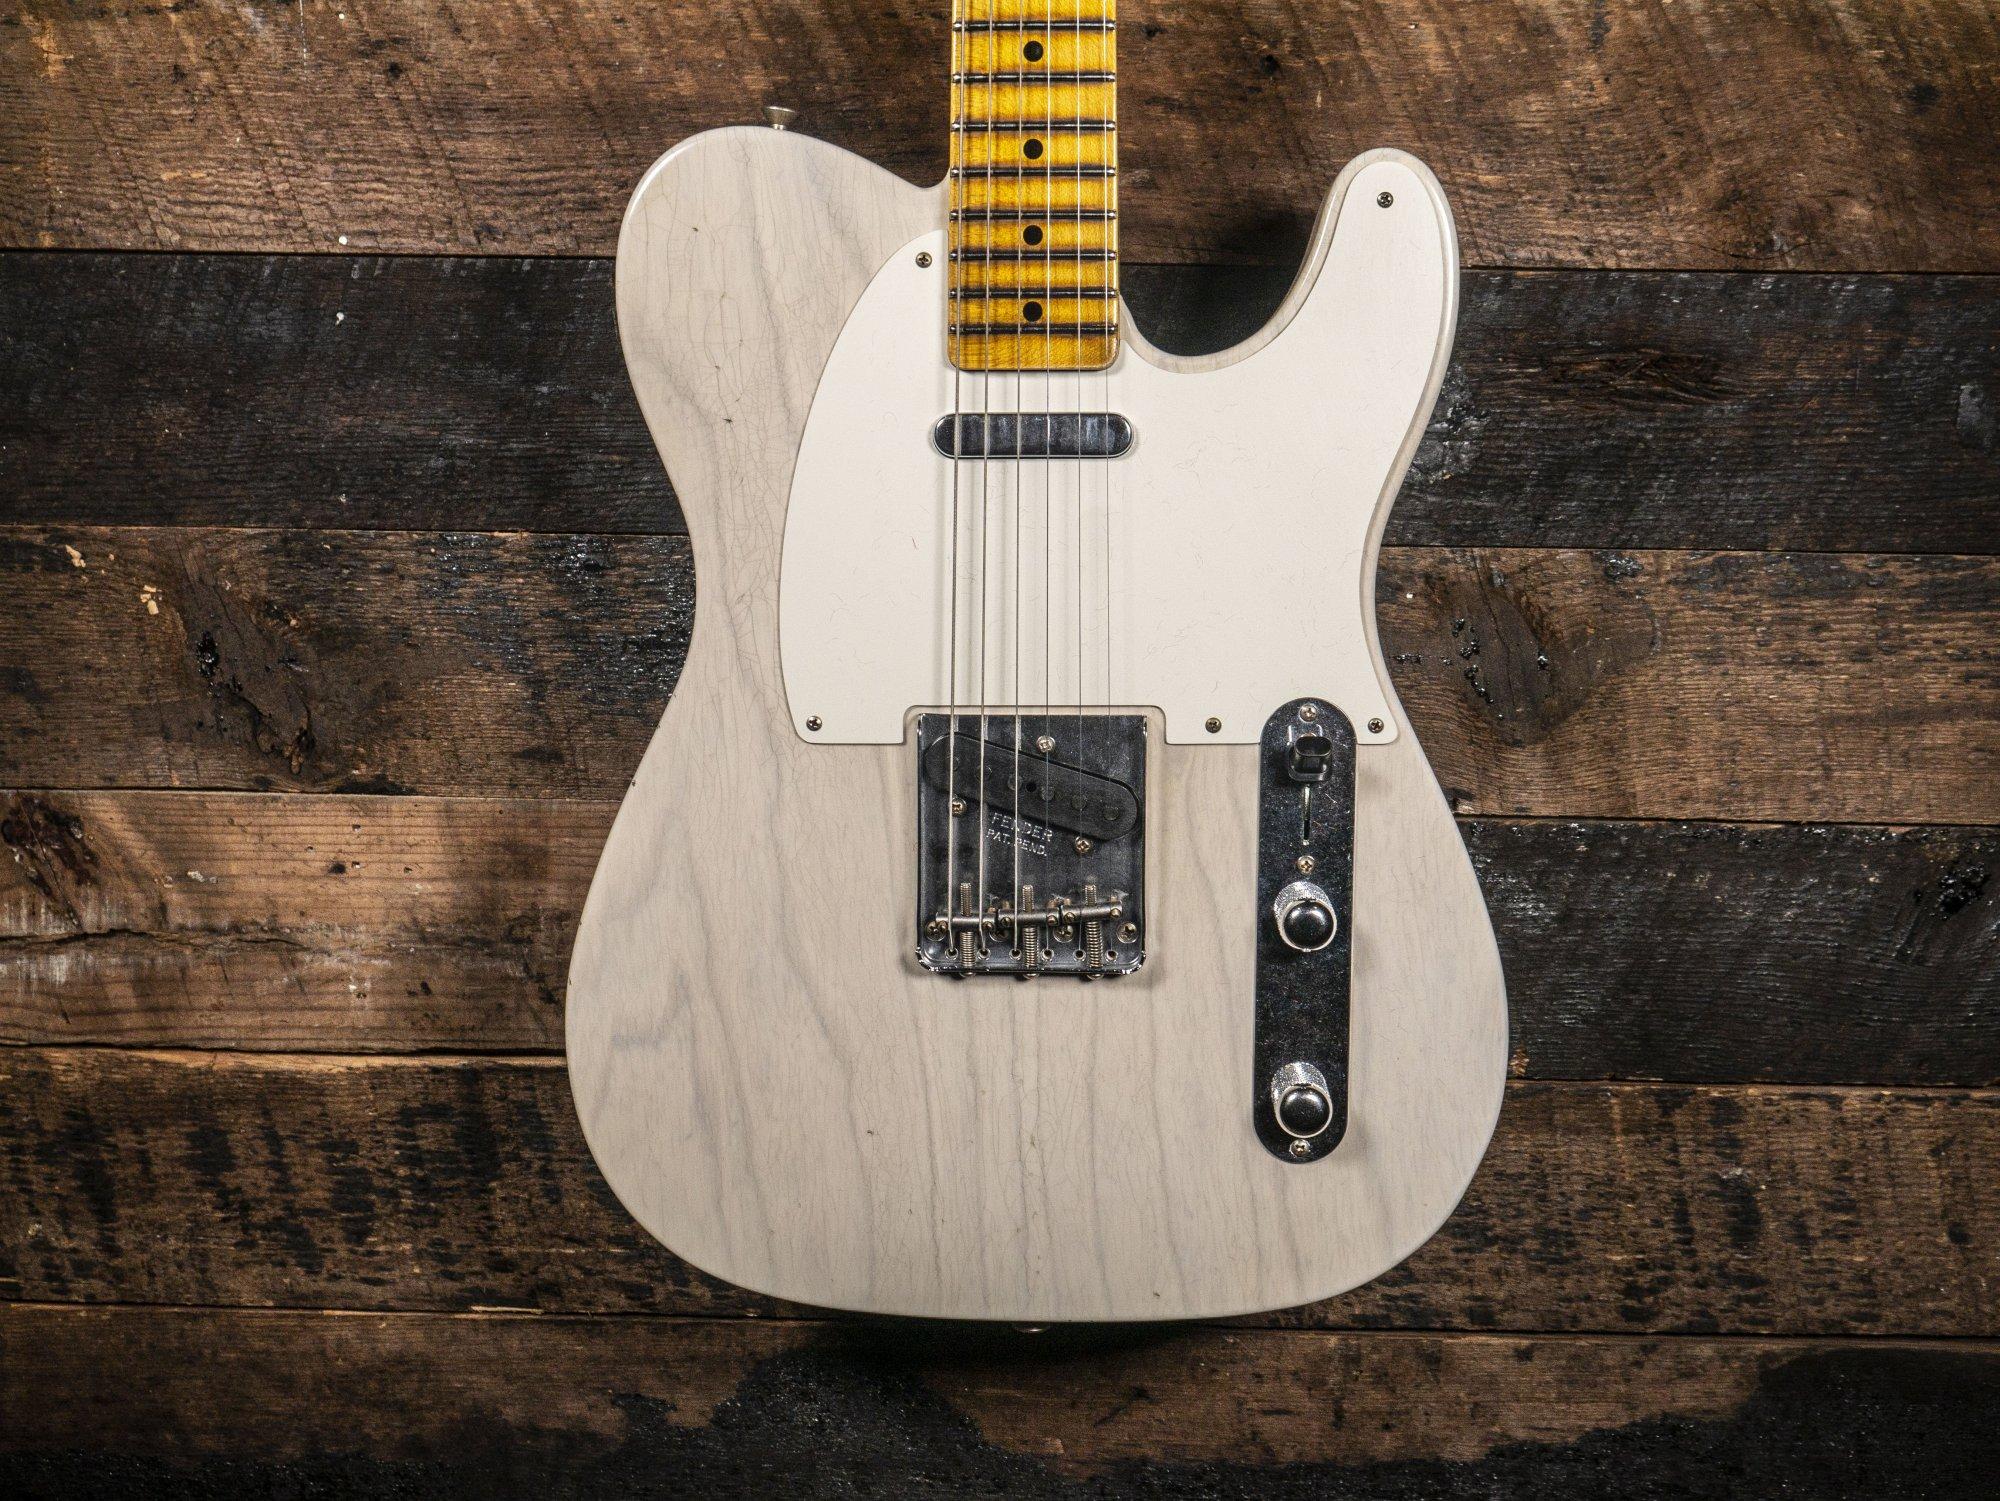 Fender Custom Shop Limited Journeyman 55' Aged White Blonde Telecaster